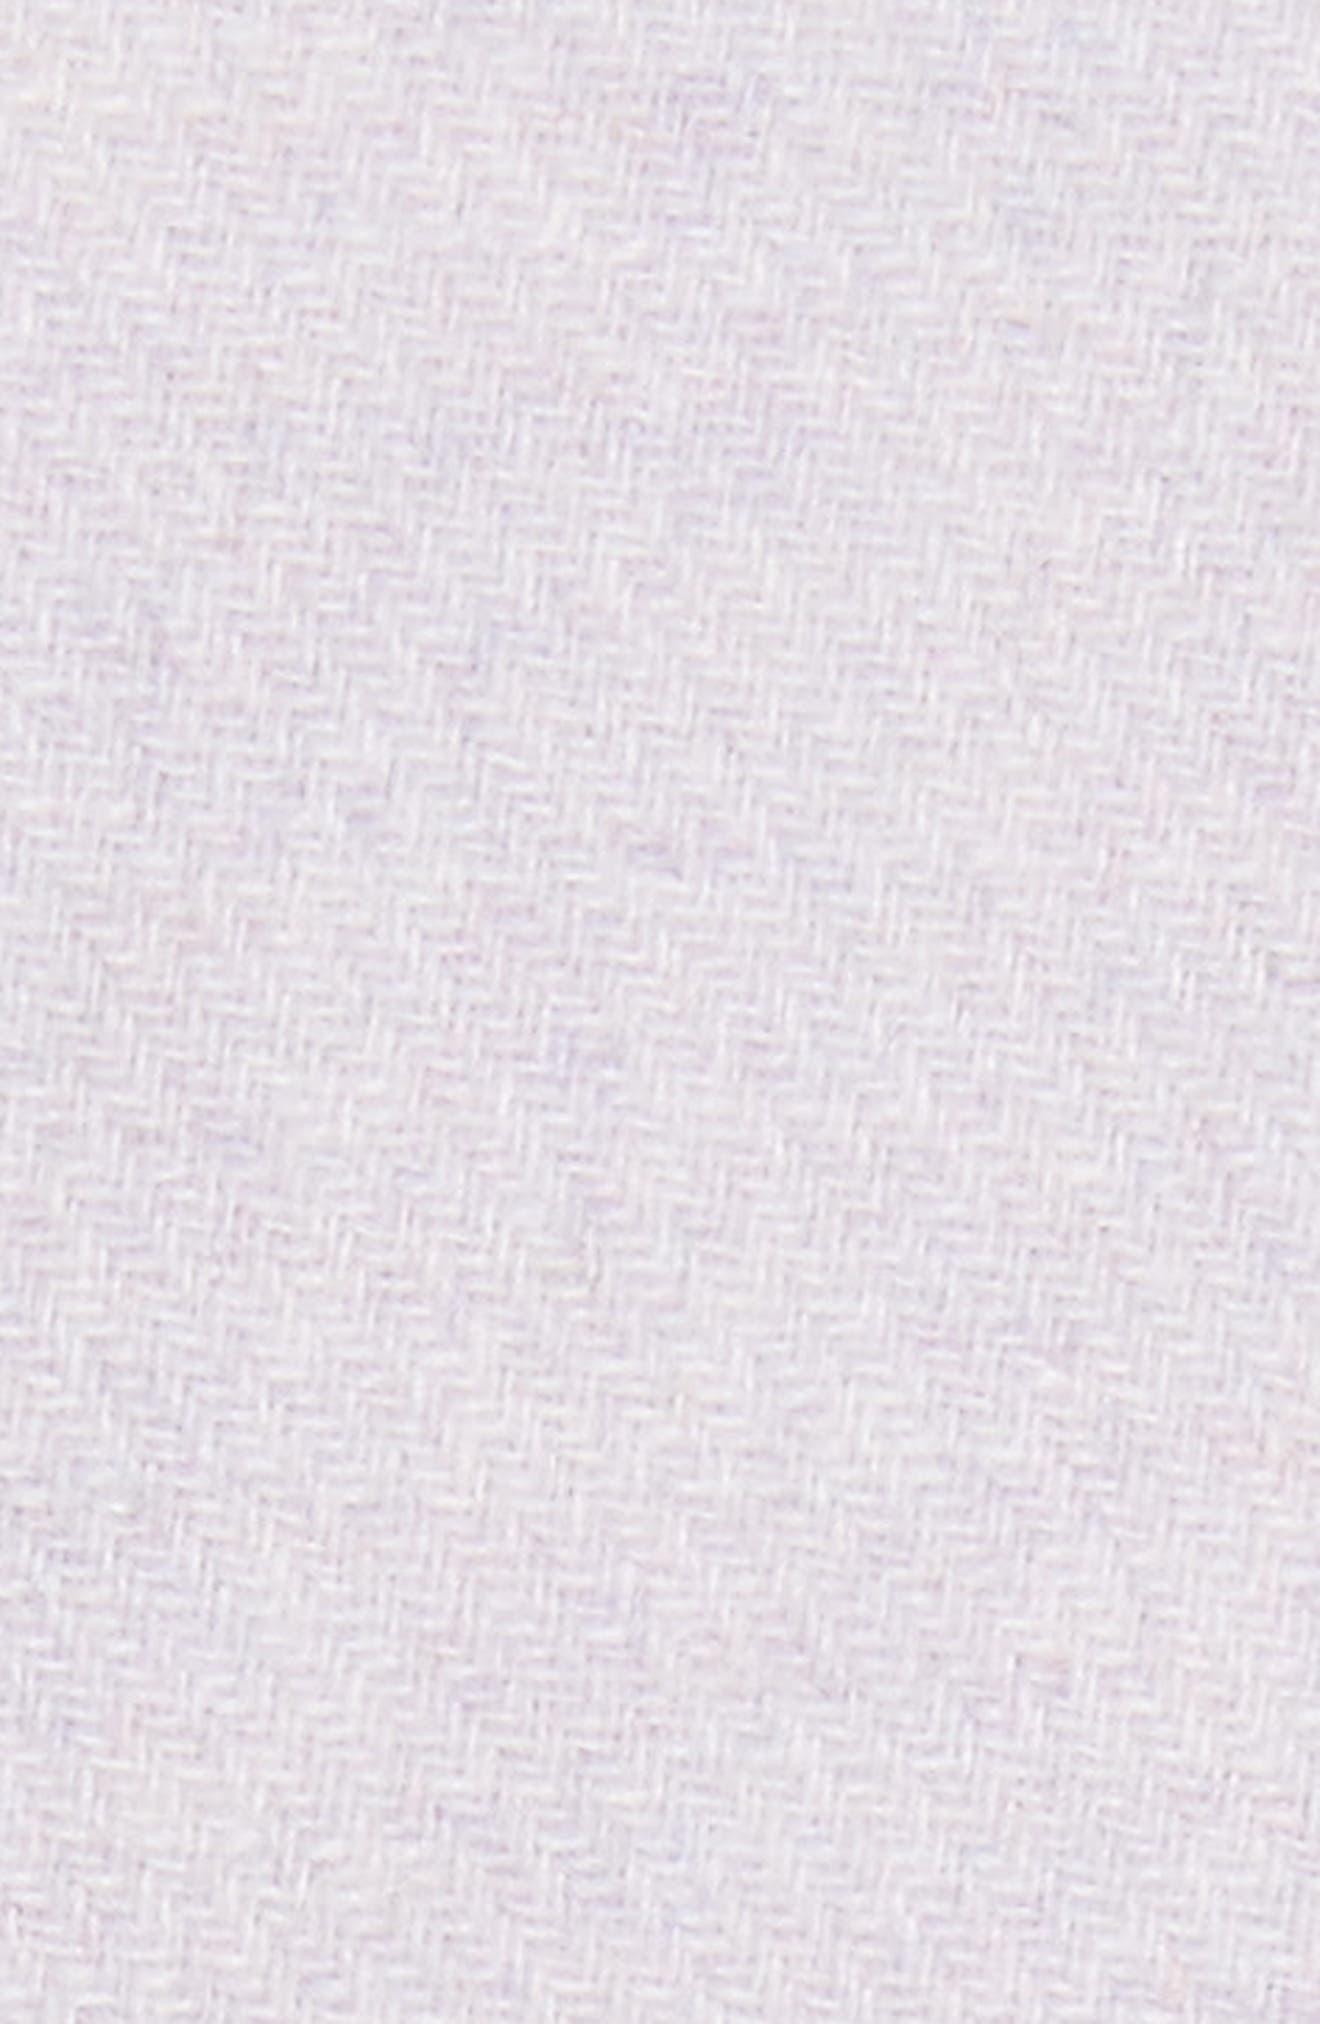 Wool Blend Melton Coat,                             Alternate thumbnail 6, color,                             538